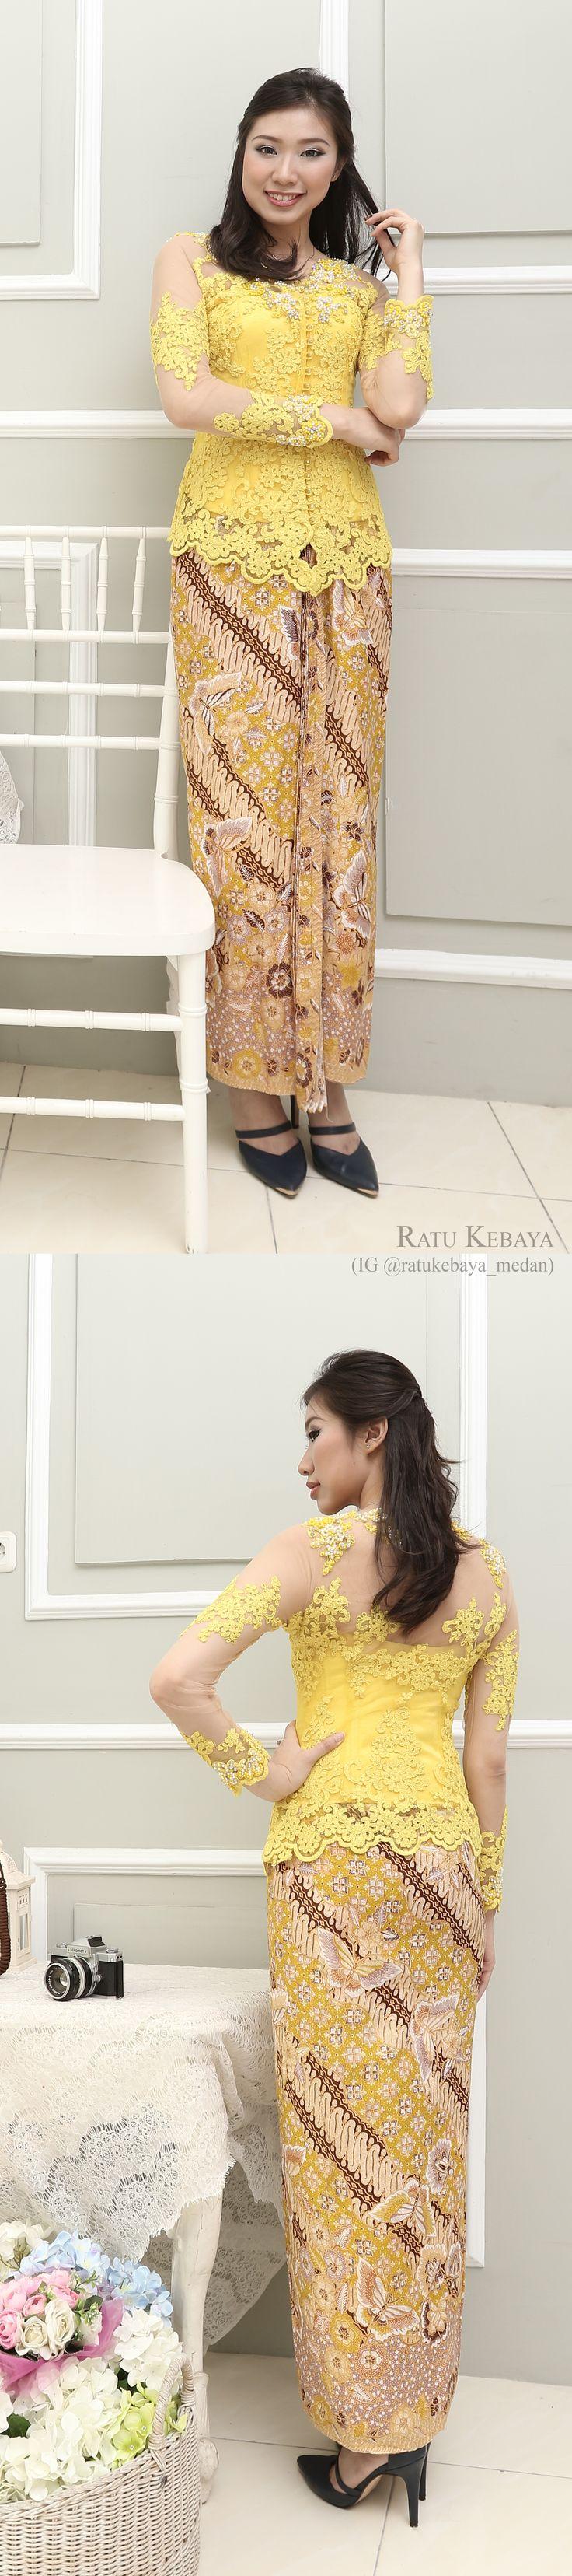 Inspirasi kebaya ratukebaya medan Padanan lace dan batik